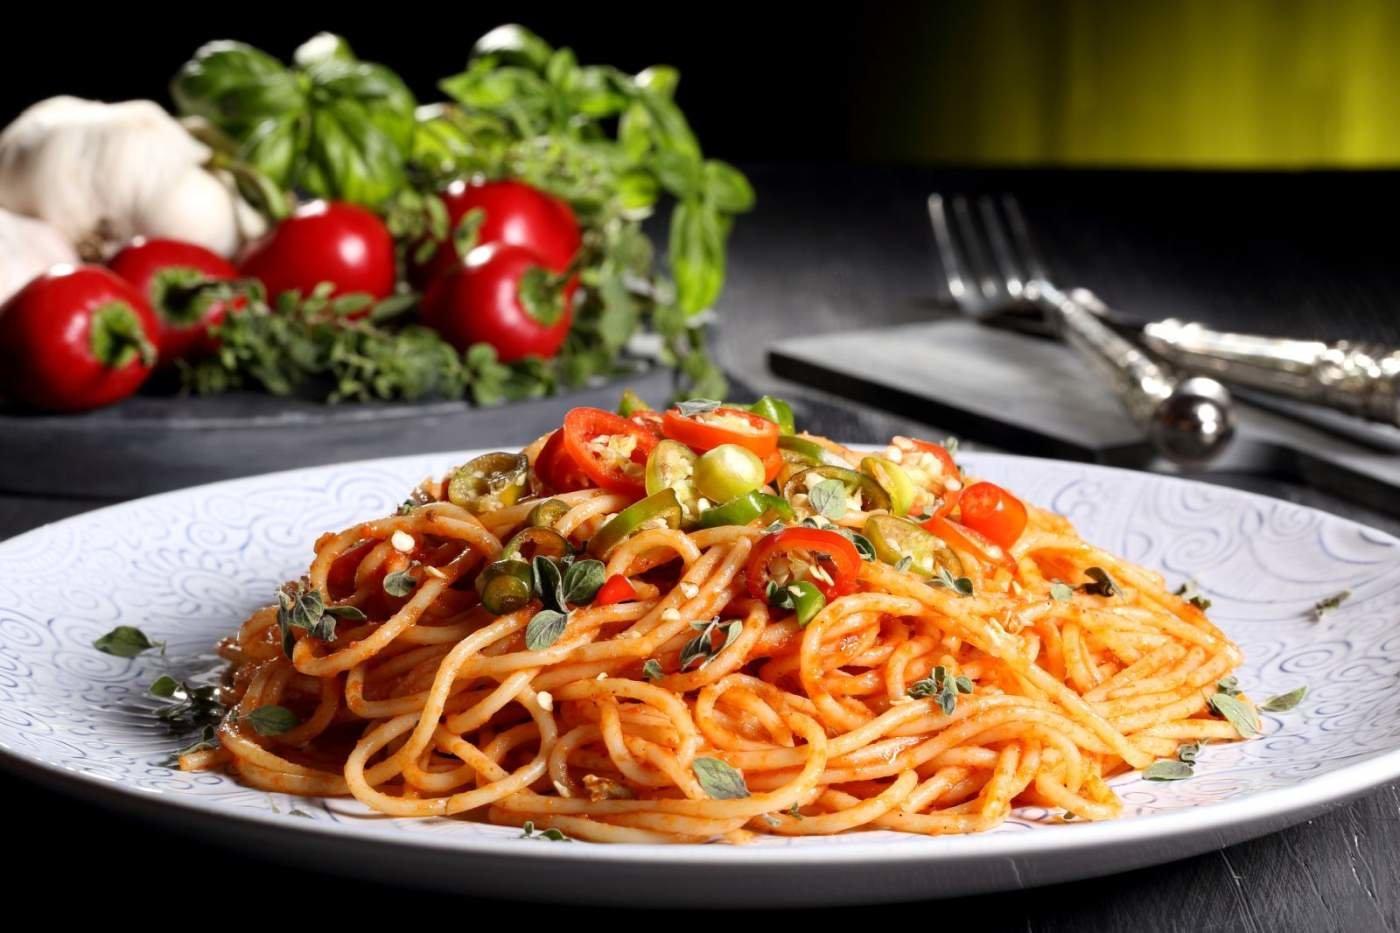 Сперма на спагетти 4 фотография